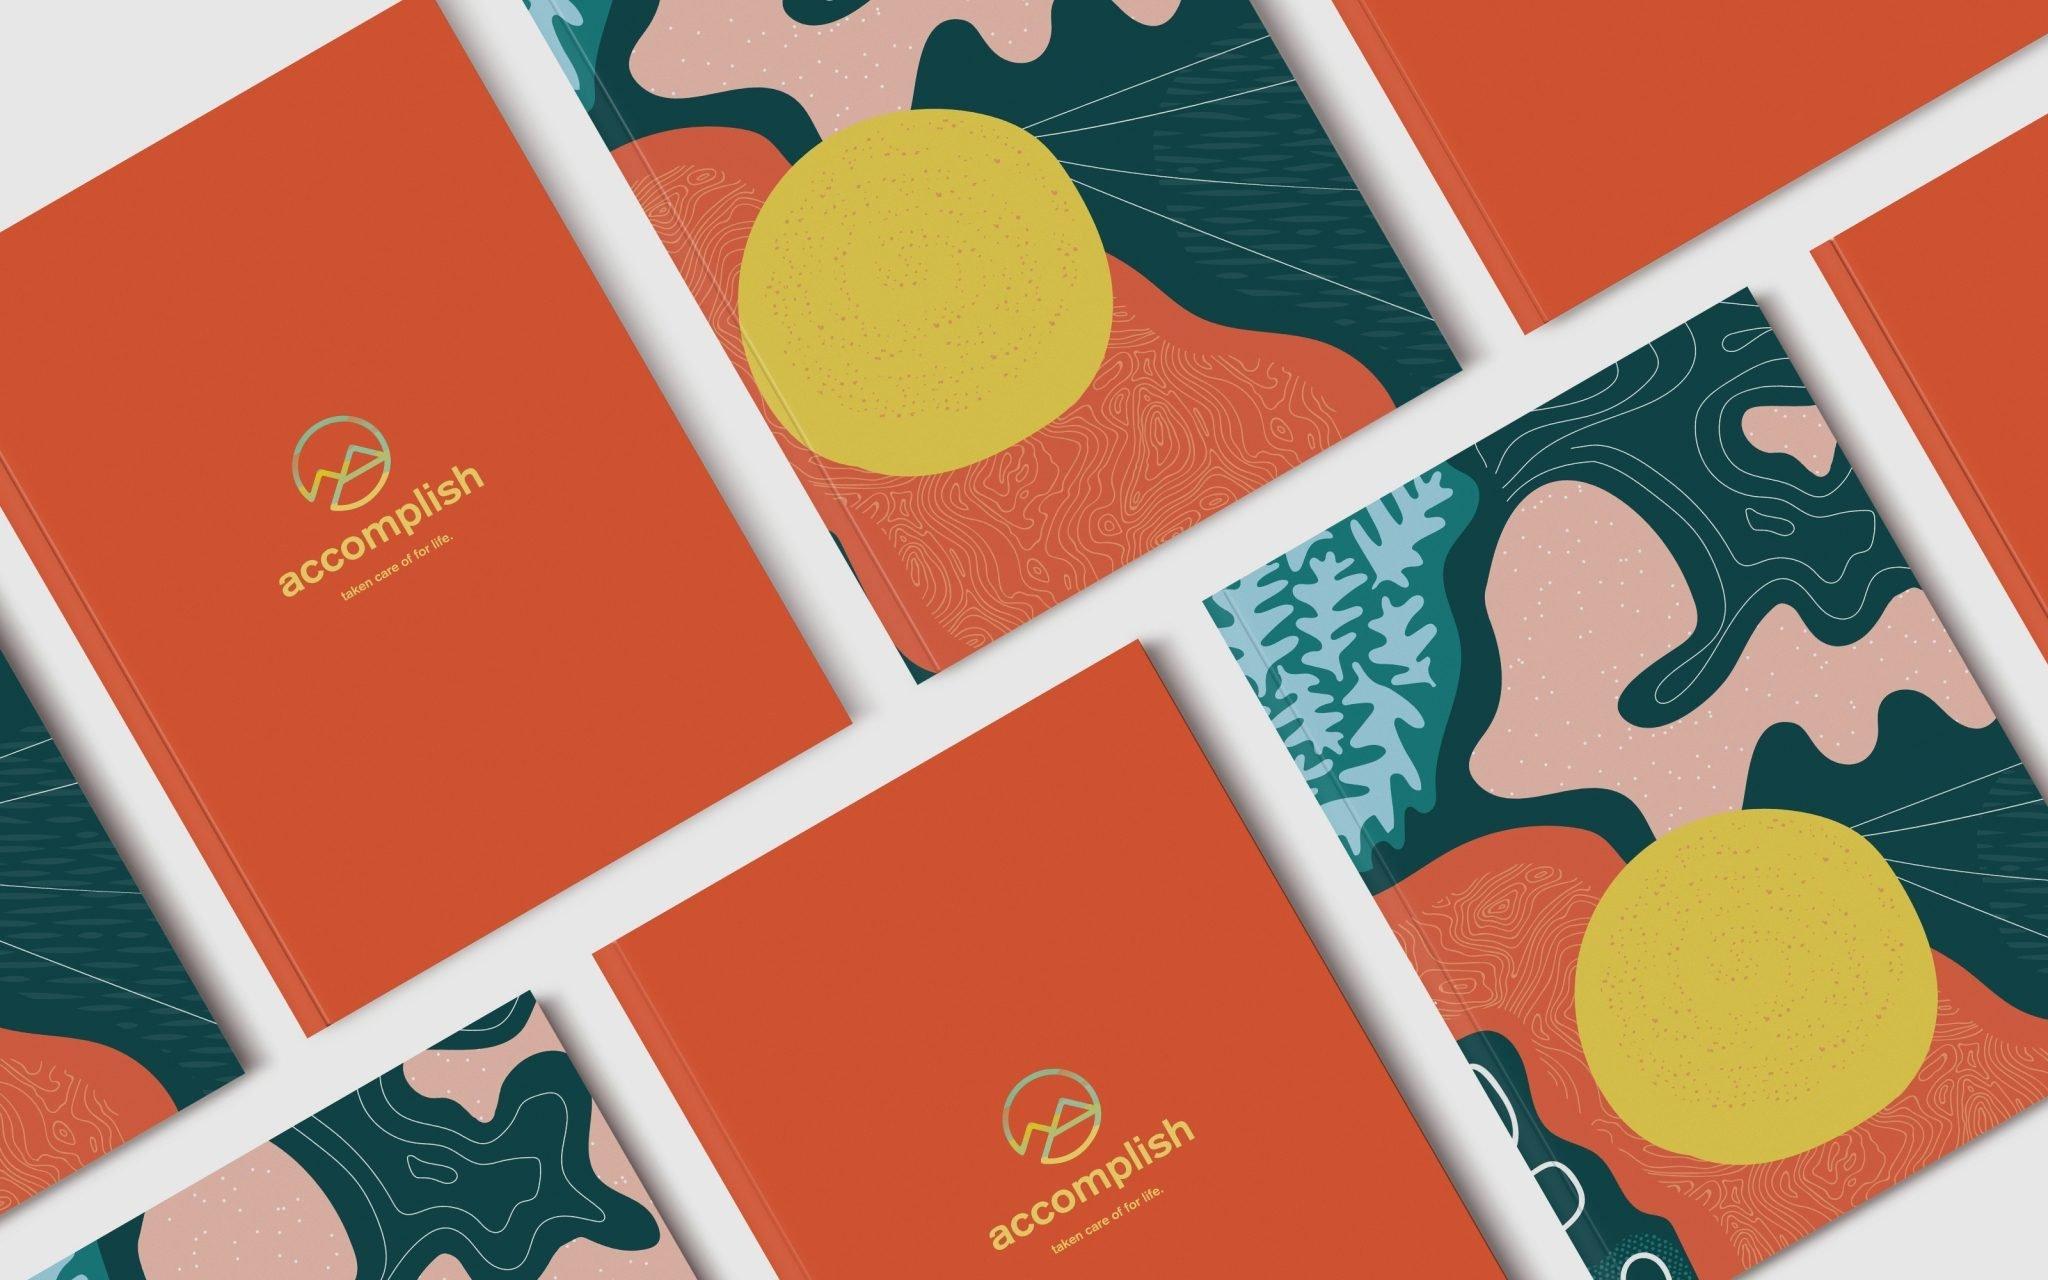 Accomplish-Insurance-Branding-Walczak-Design-Best